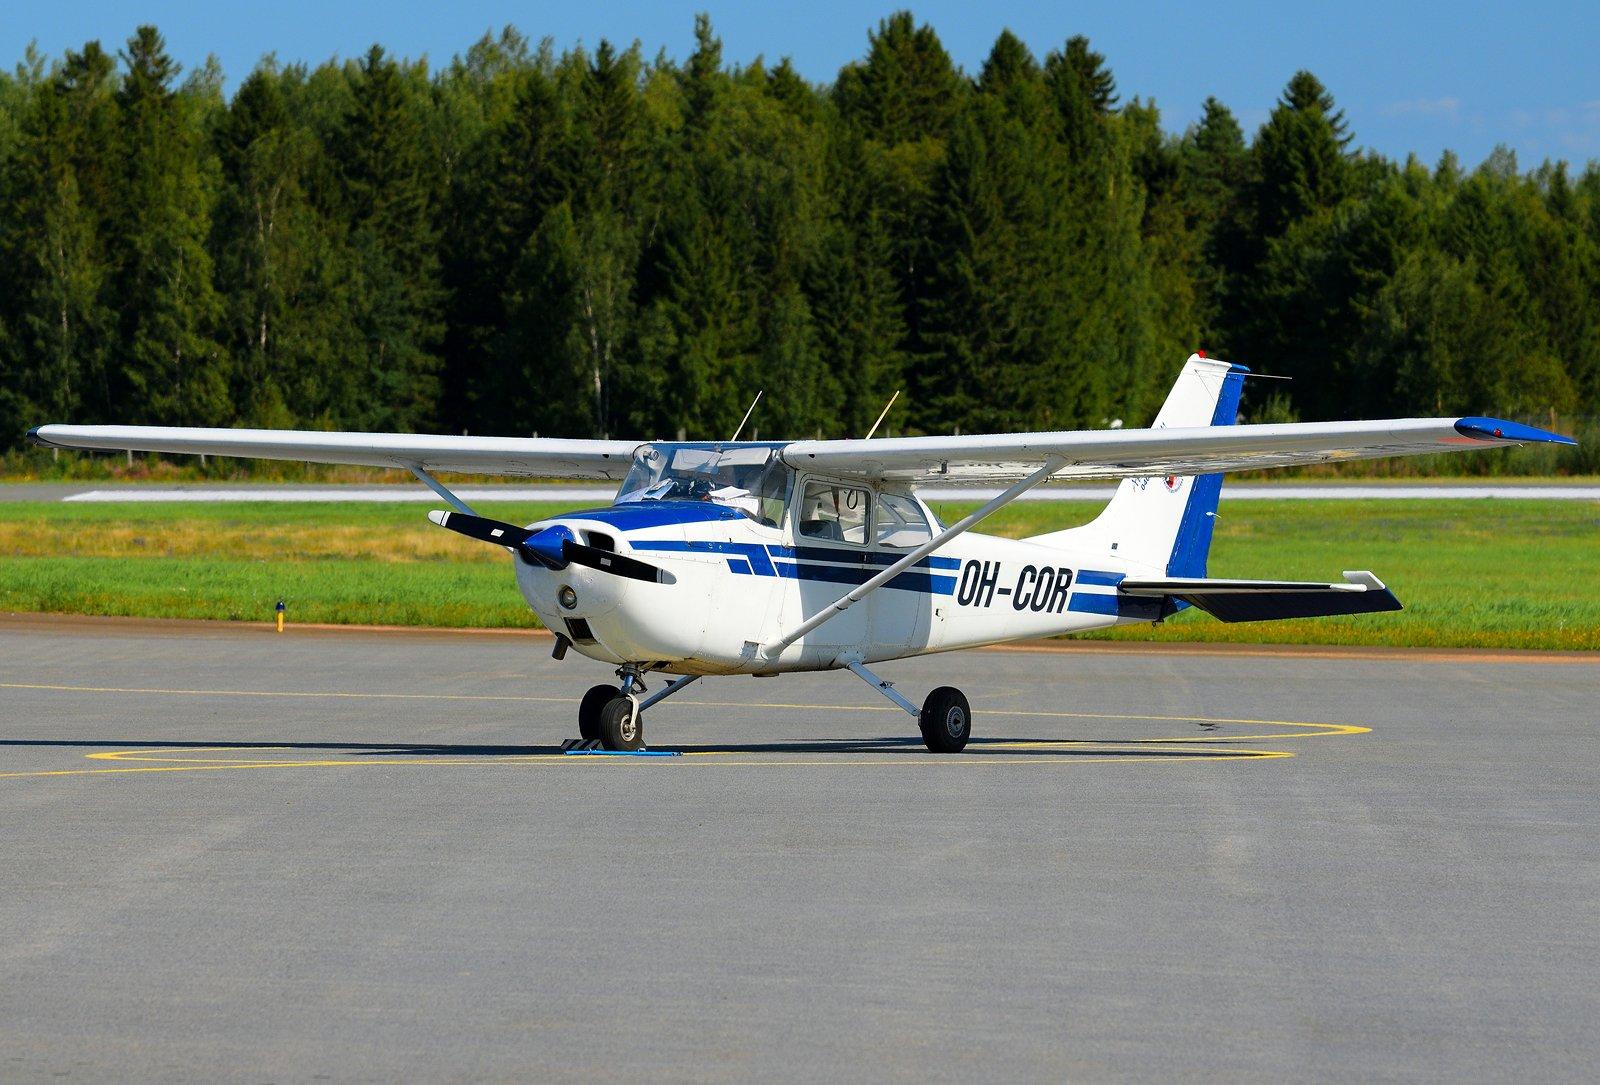 OH-COR - Reims-Cessna F172L Skyhawk - 9.8.2020